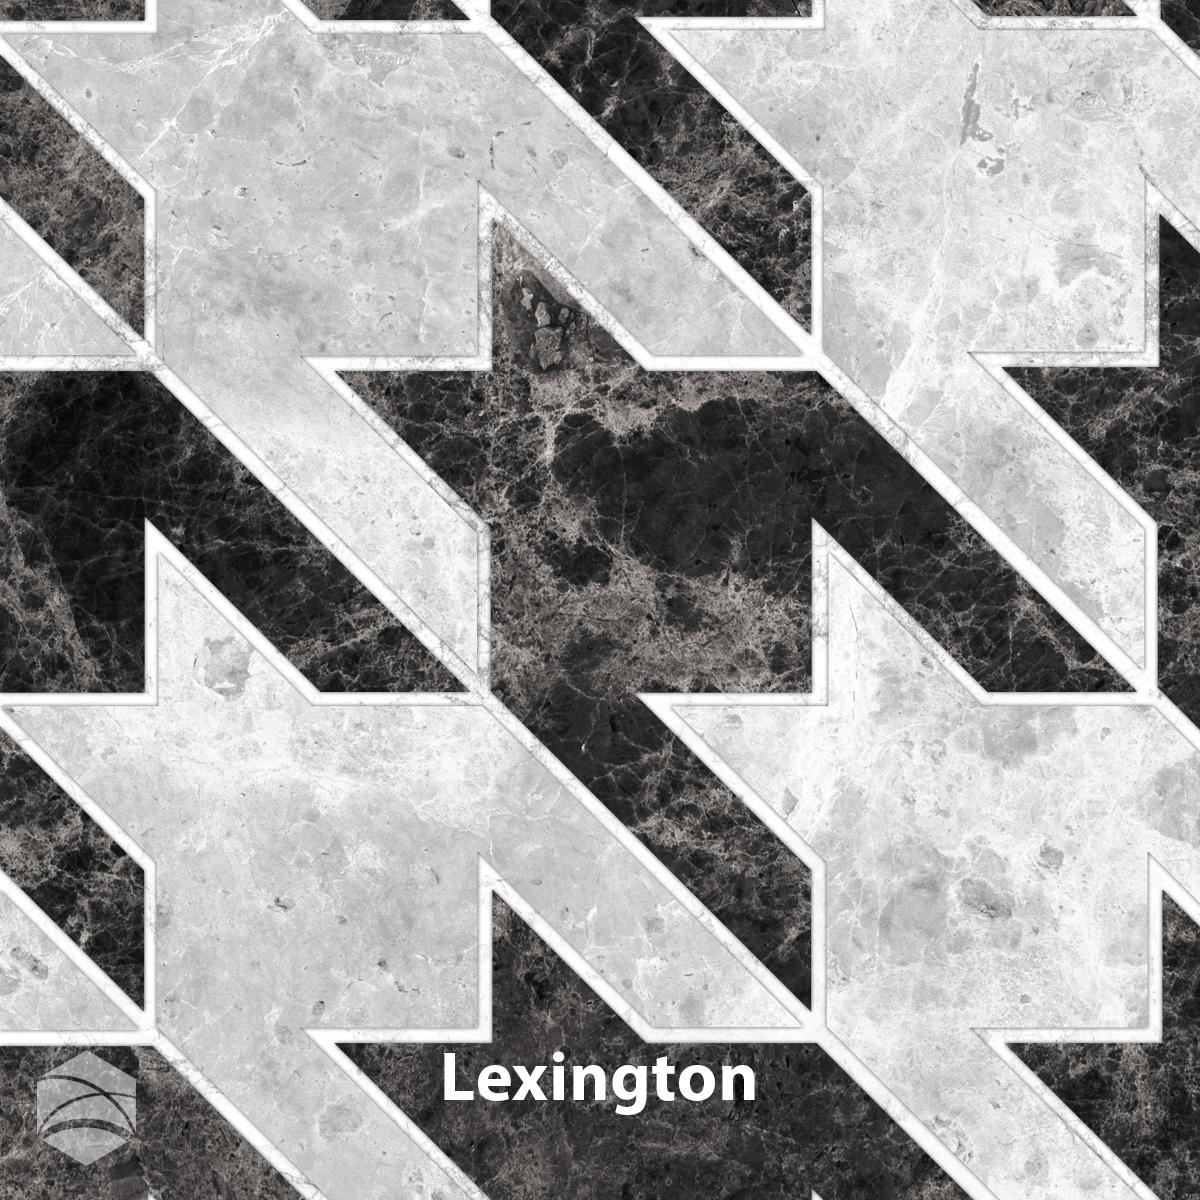 Lexington_V2_12x12.jpg